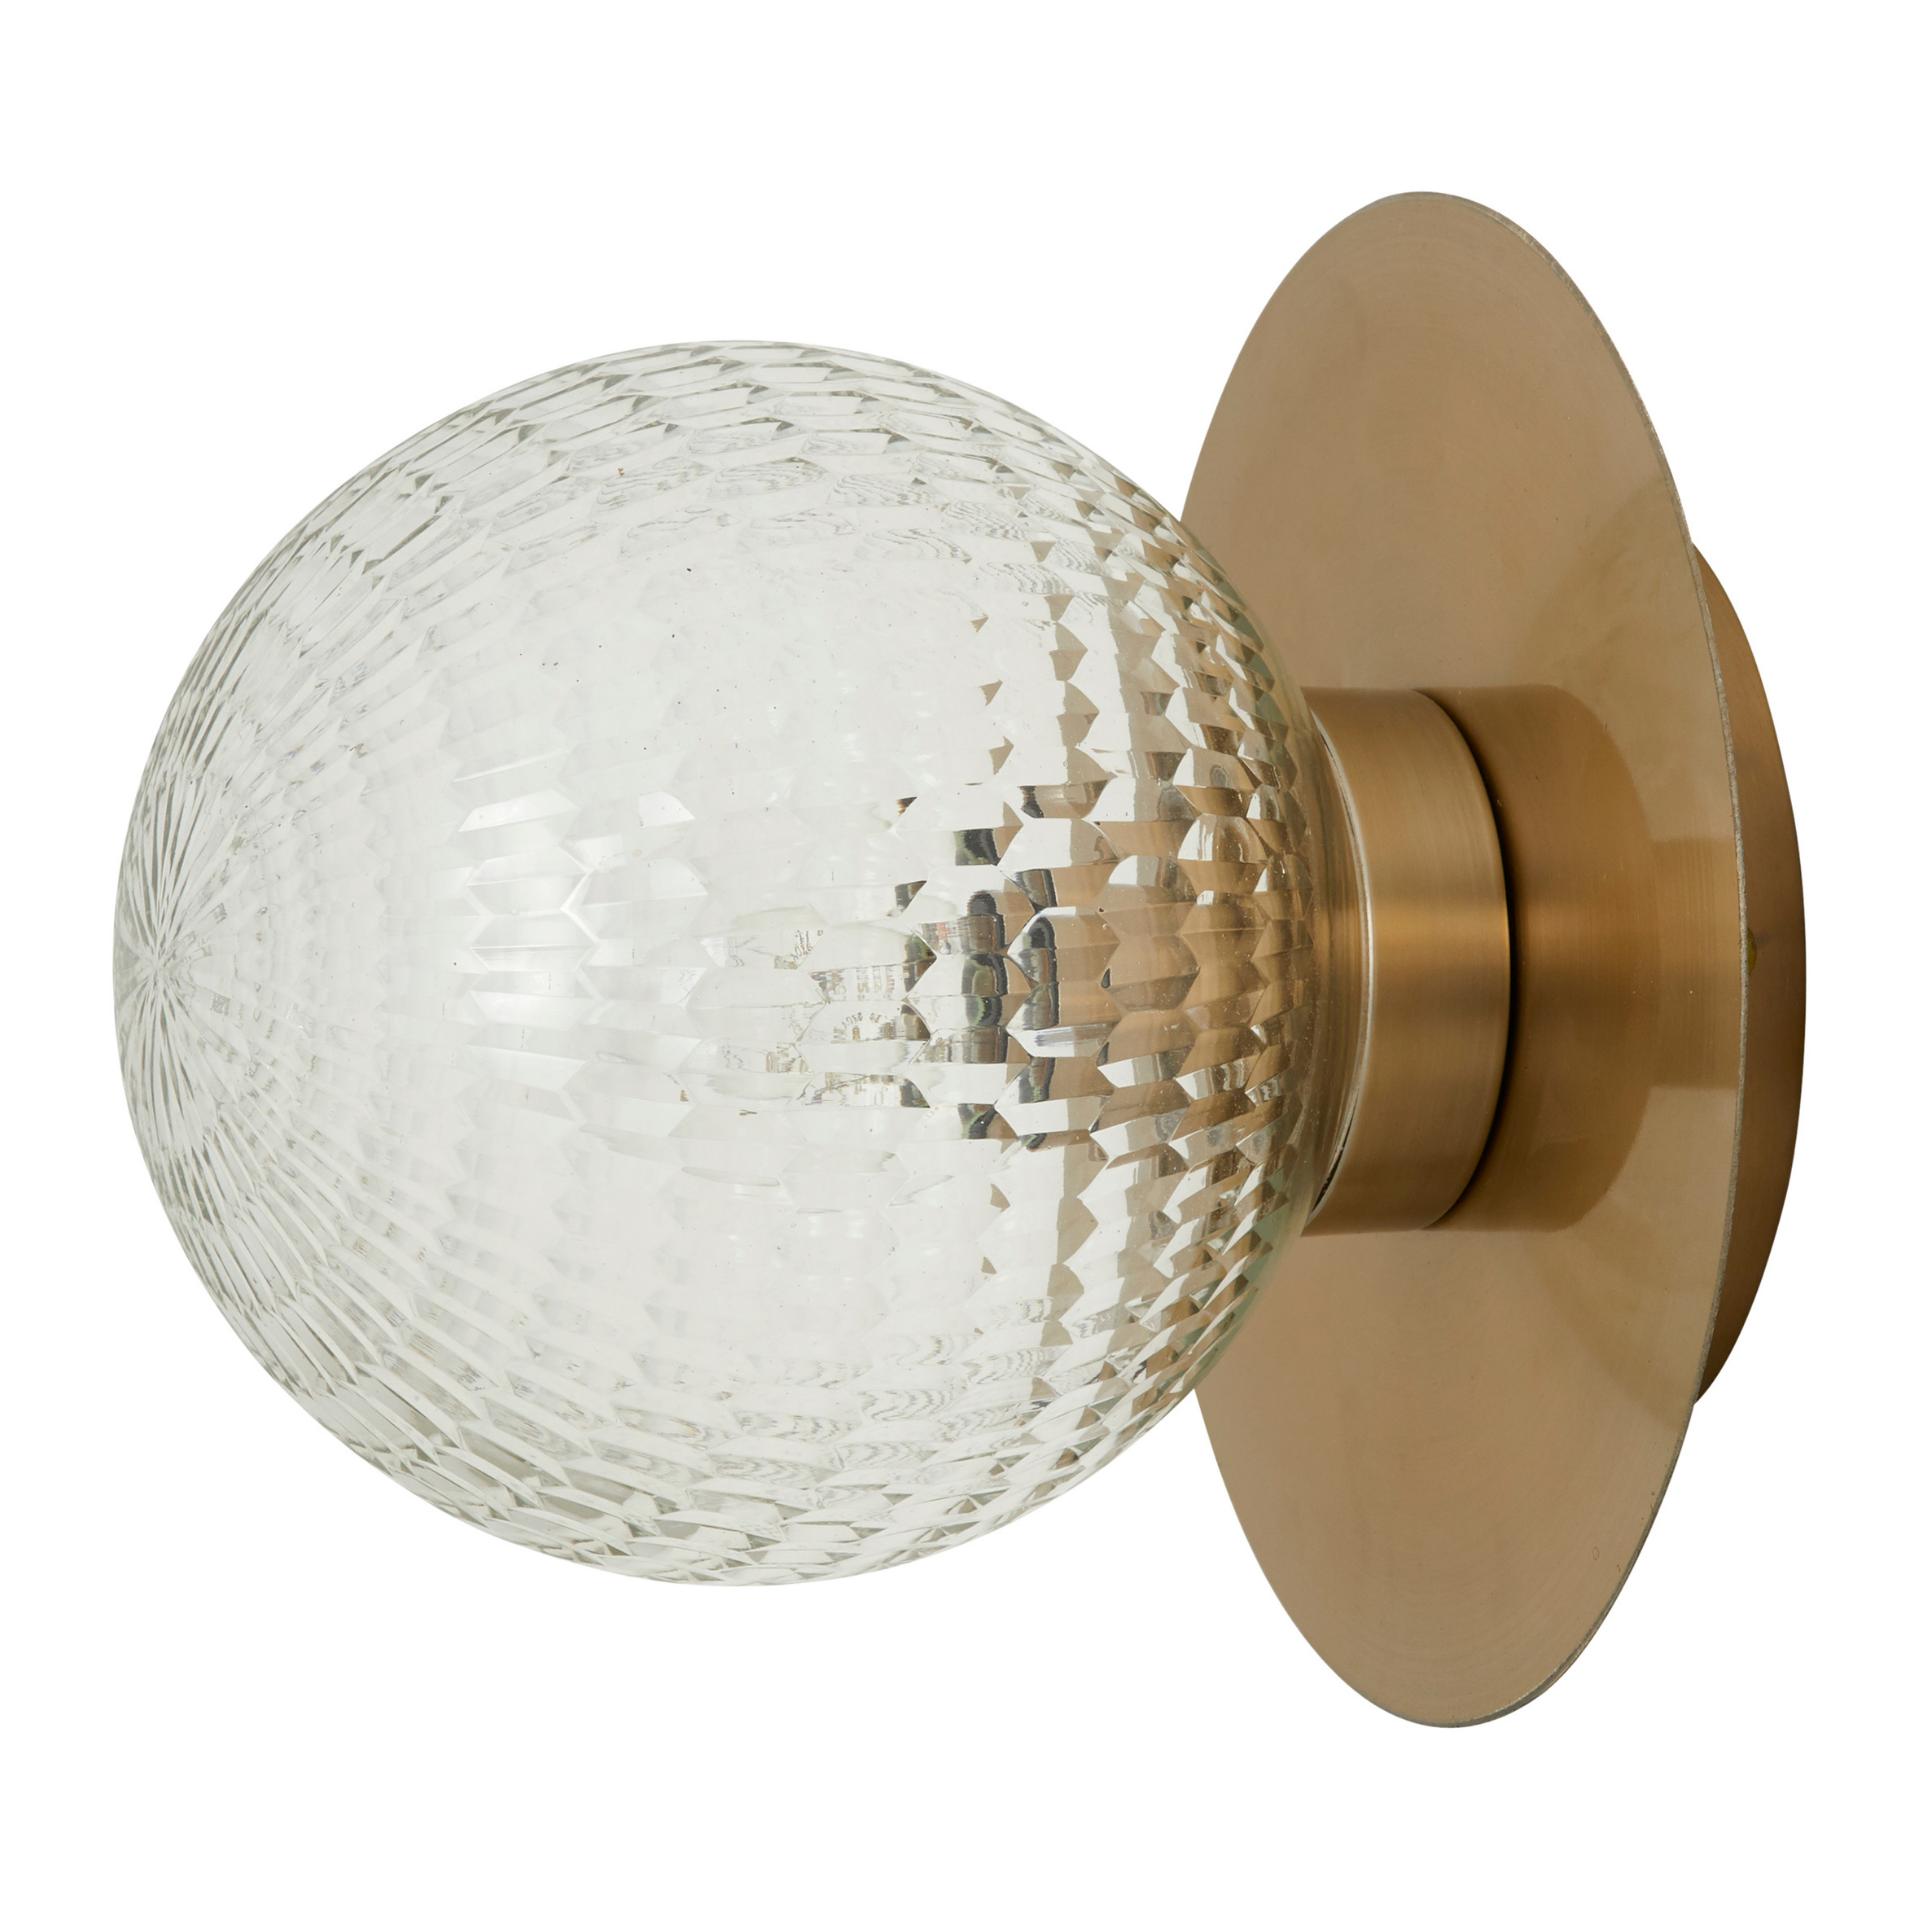 Nordal Wandlamp Anona goud/glas - 1573 - ø20 x 18 cm-1573-5708309164144